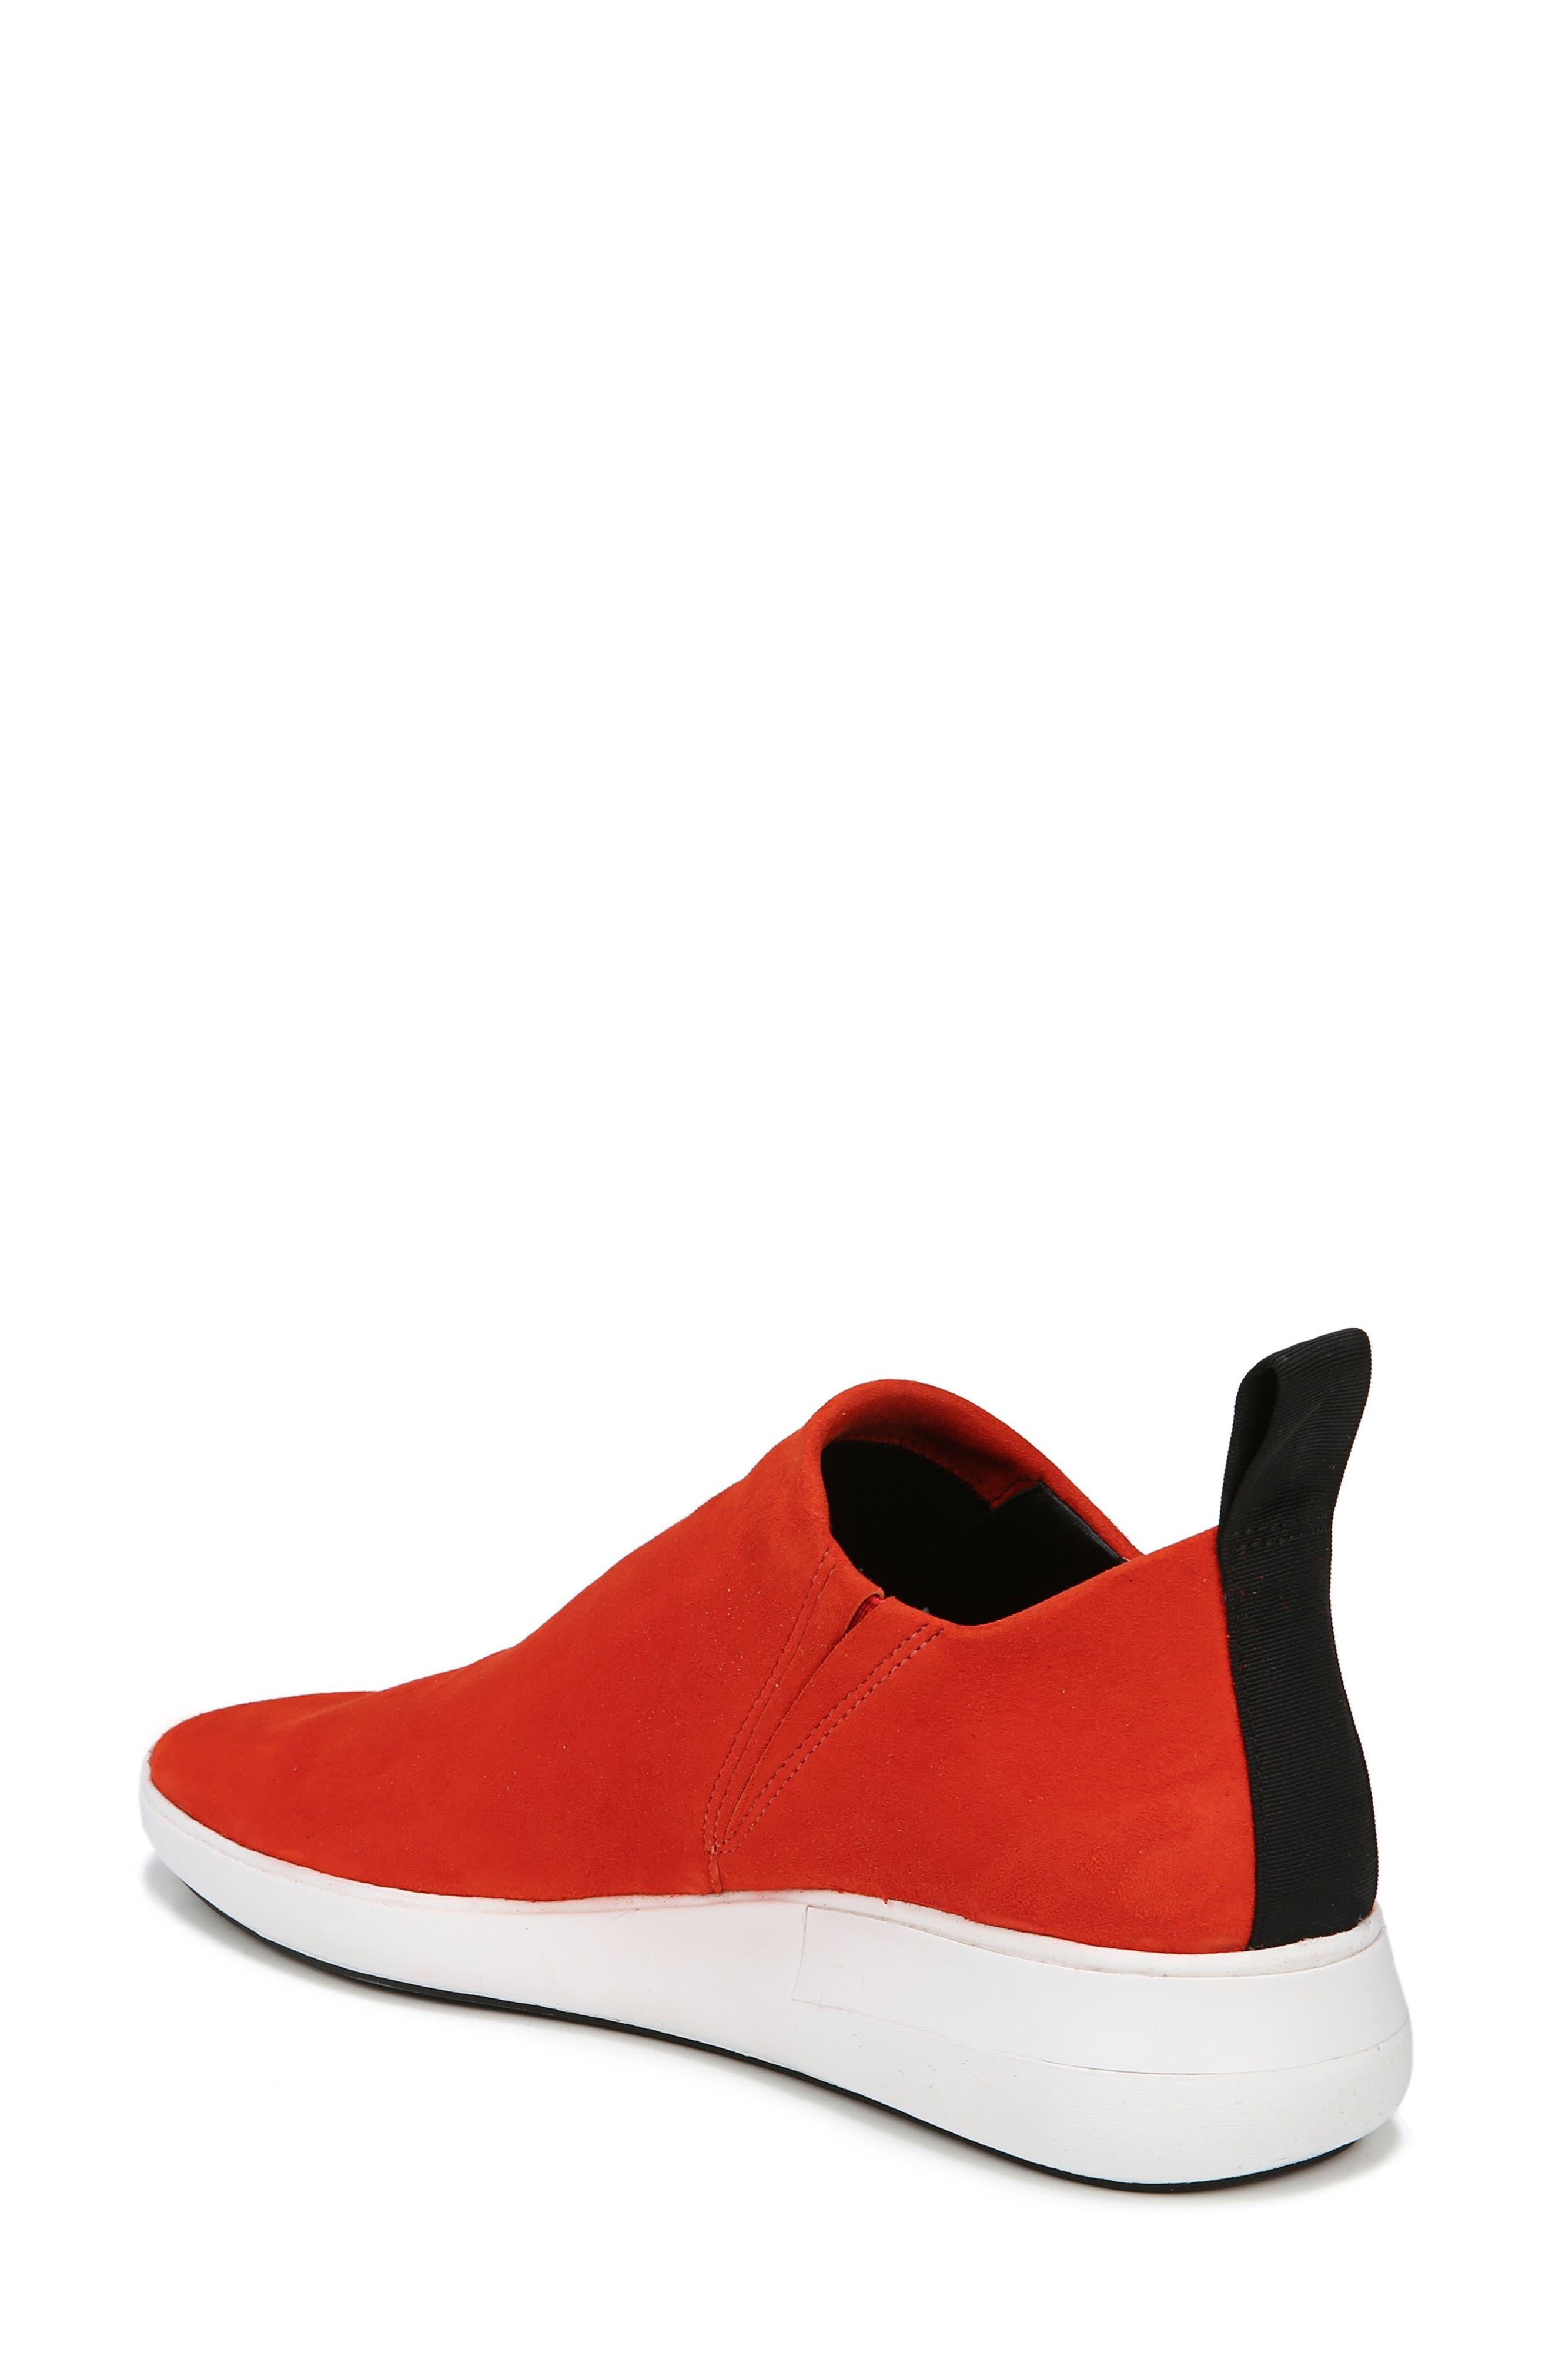 Marlow Slip-On Sneaker,                             Alternate thumbnail 2, color,                             SIENNA